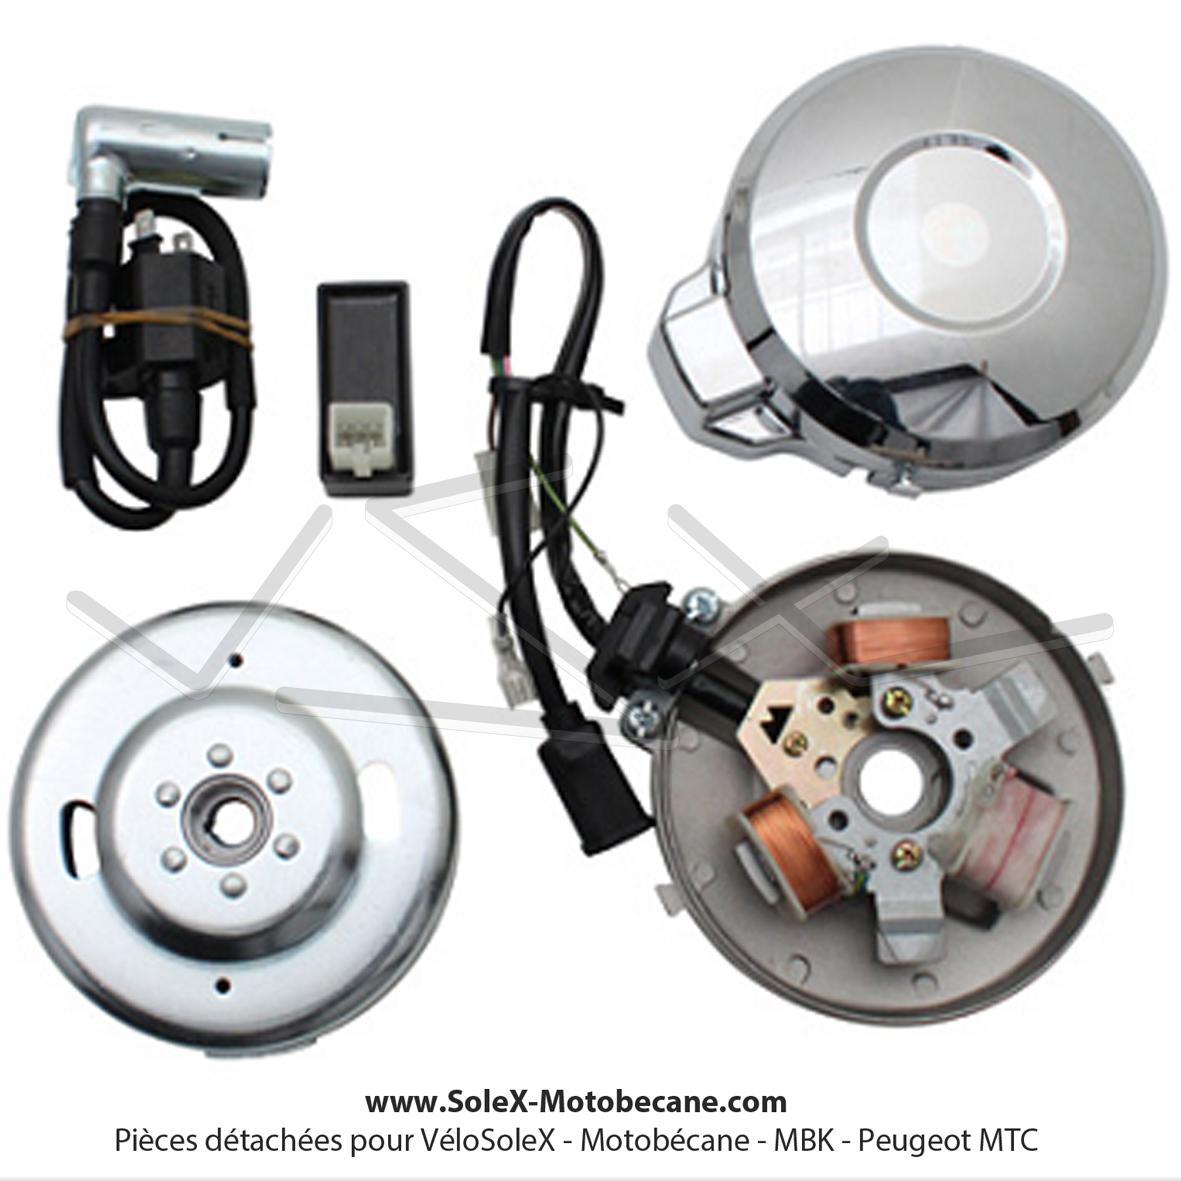 rotors volants magn tiques stator pi ces pour peugeot 101 102 103 104 bb. Black Bedroom Furniture Sets. Home Design Ideas